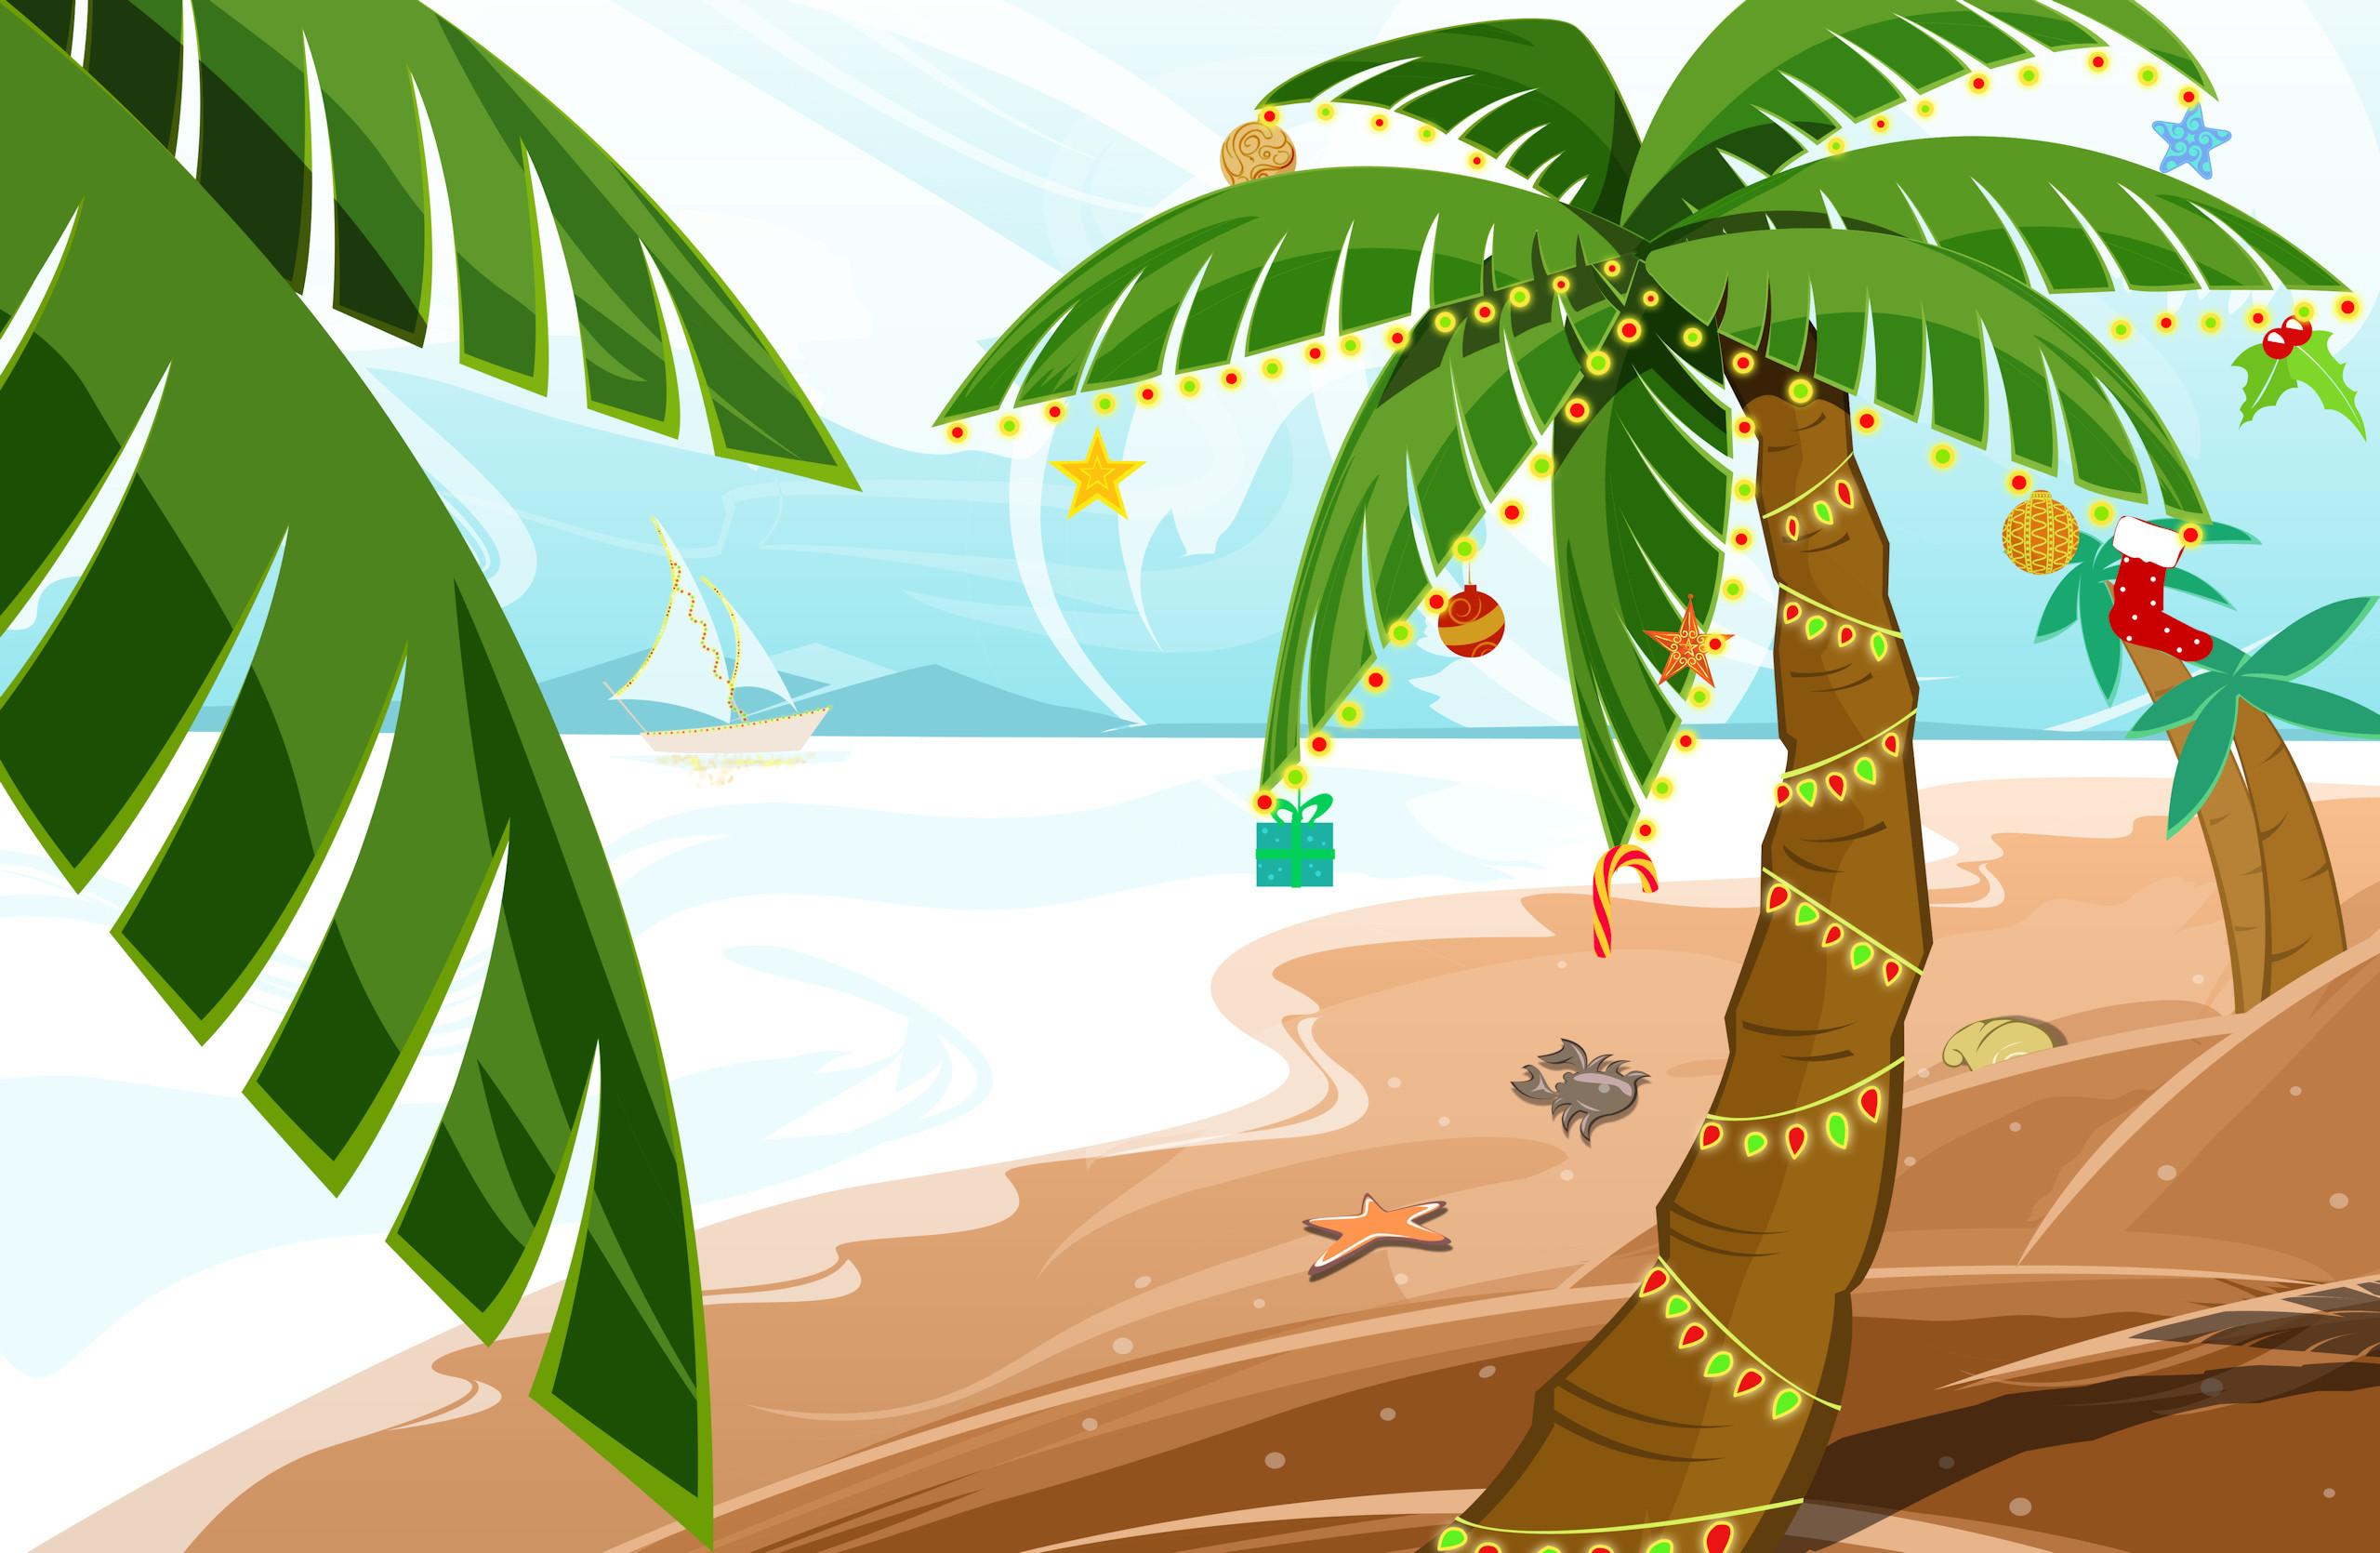 Hawaiian Tropic Girl Wallpaper Tropical Christmas Wallpaper 183 ①